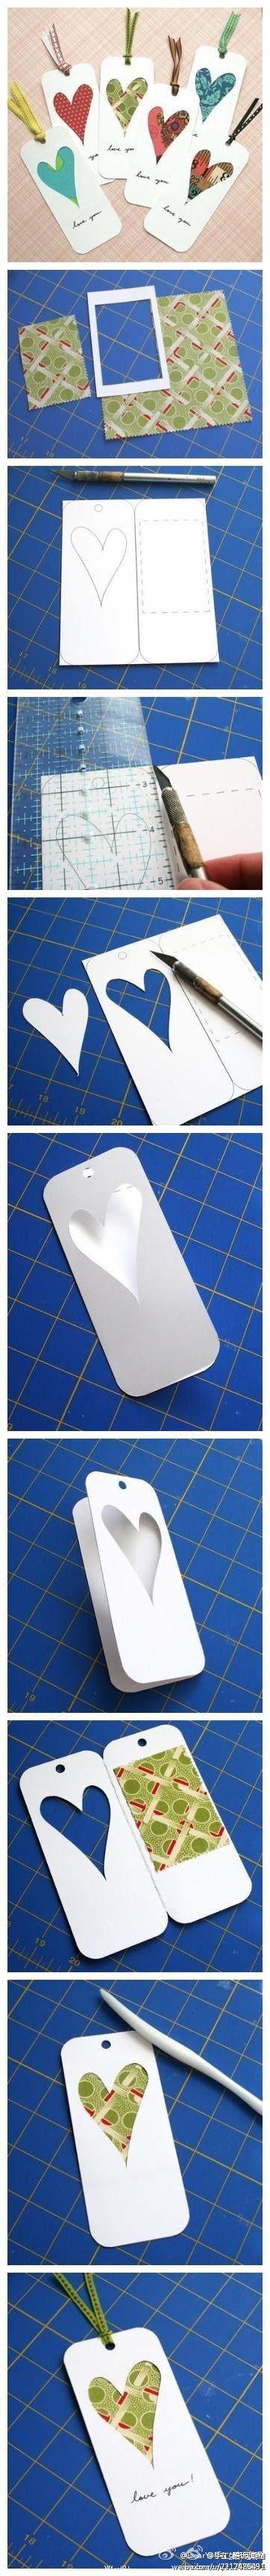 Cute heart bookmark